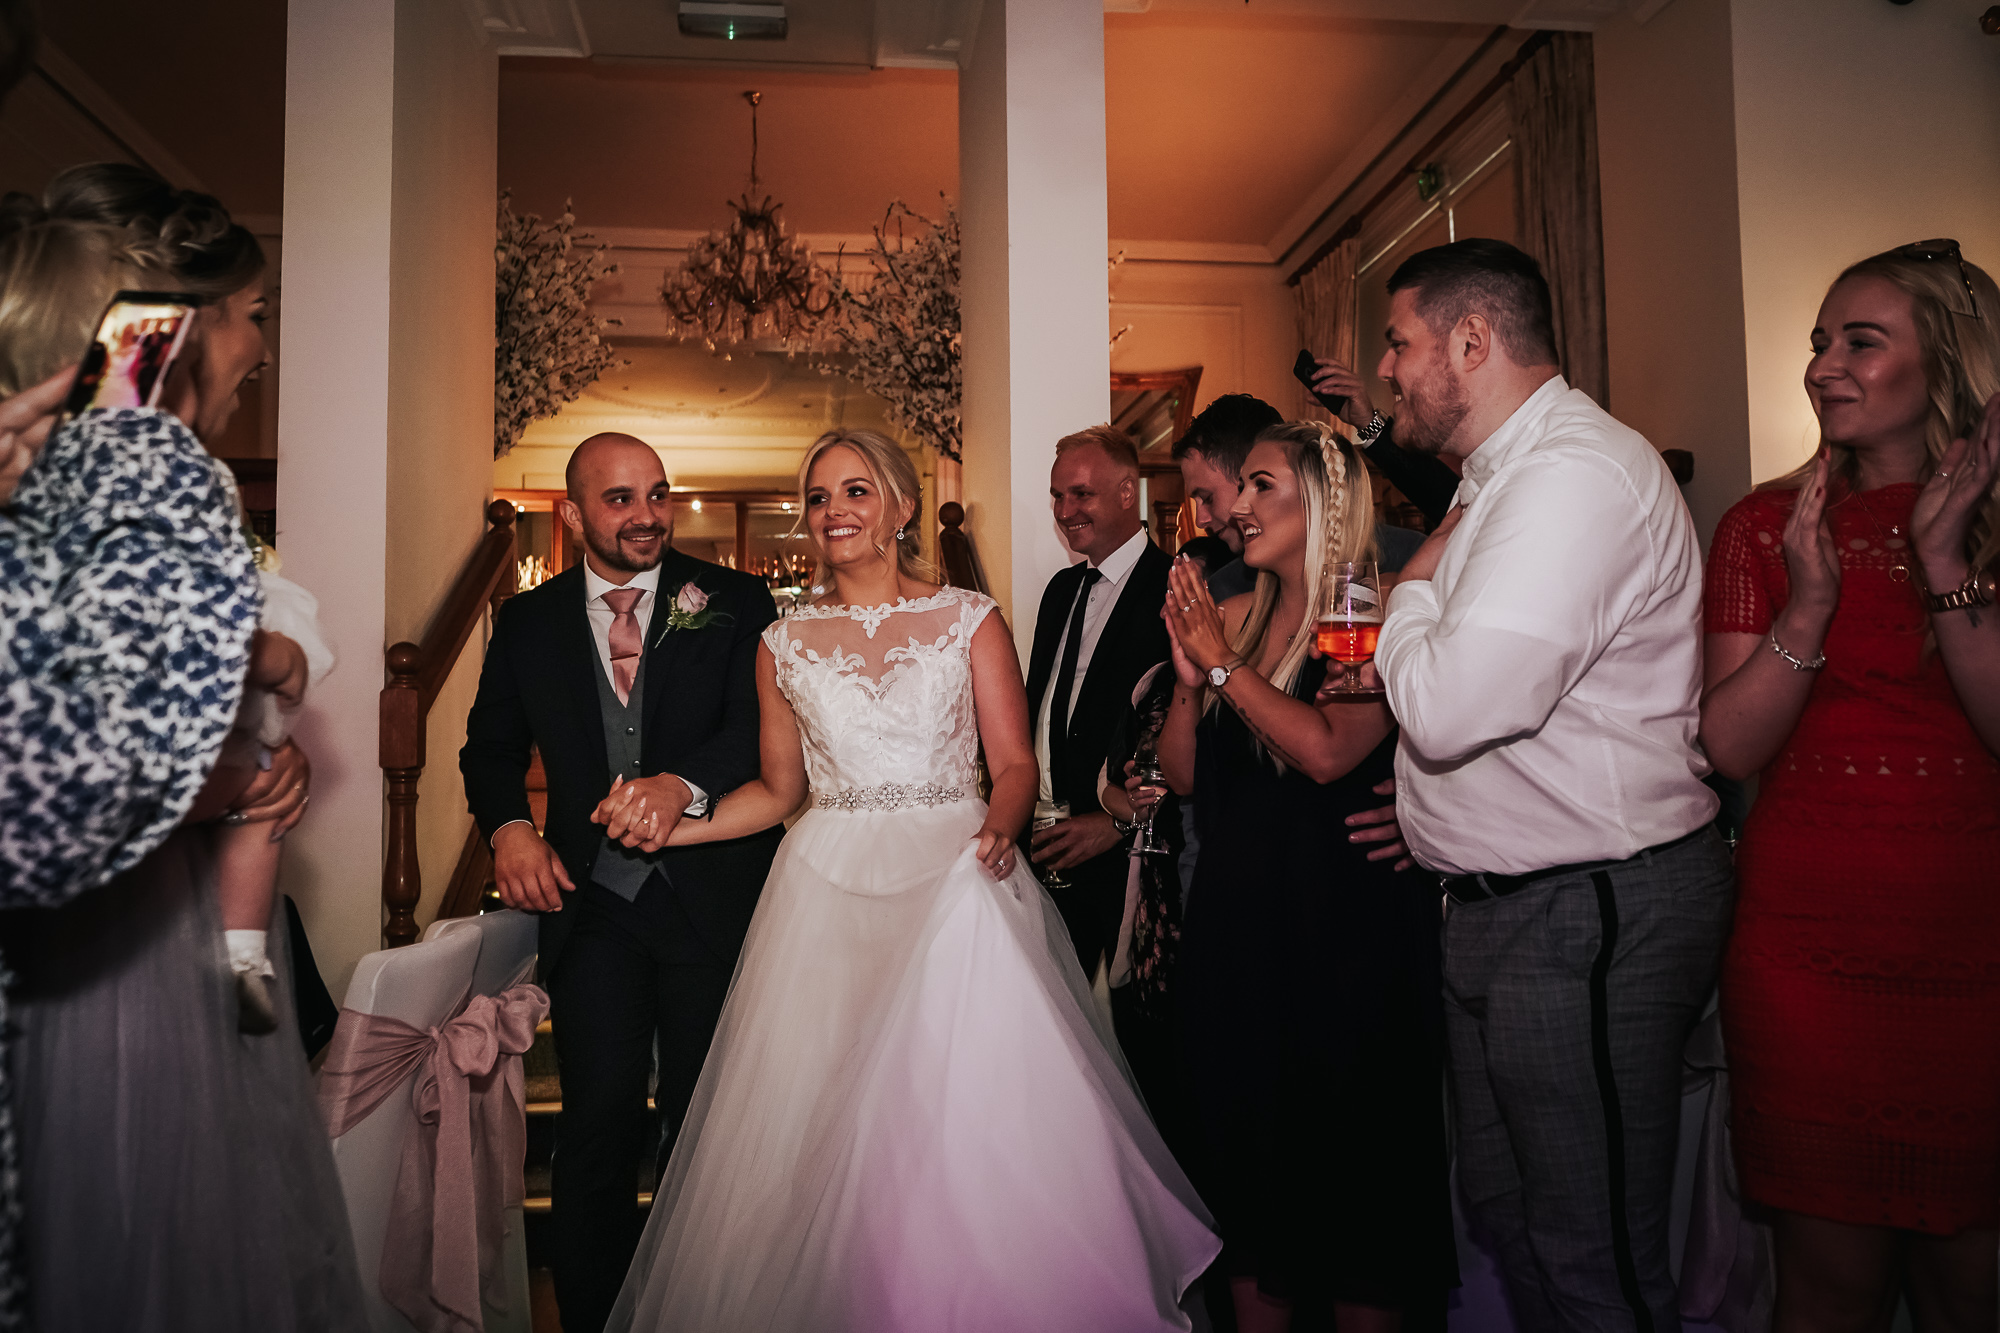 West Tower Wedding Photographer Ormskirk Lancashire wedding photography (53 of 57).jpg